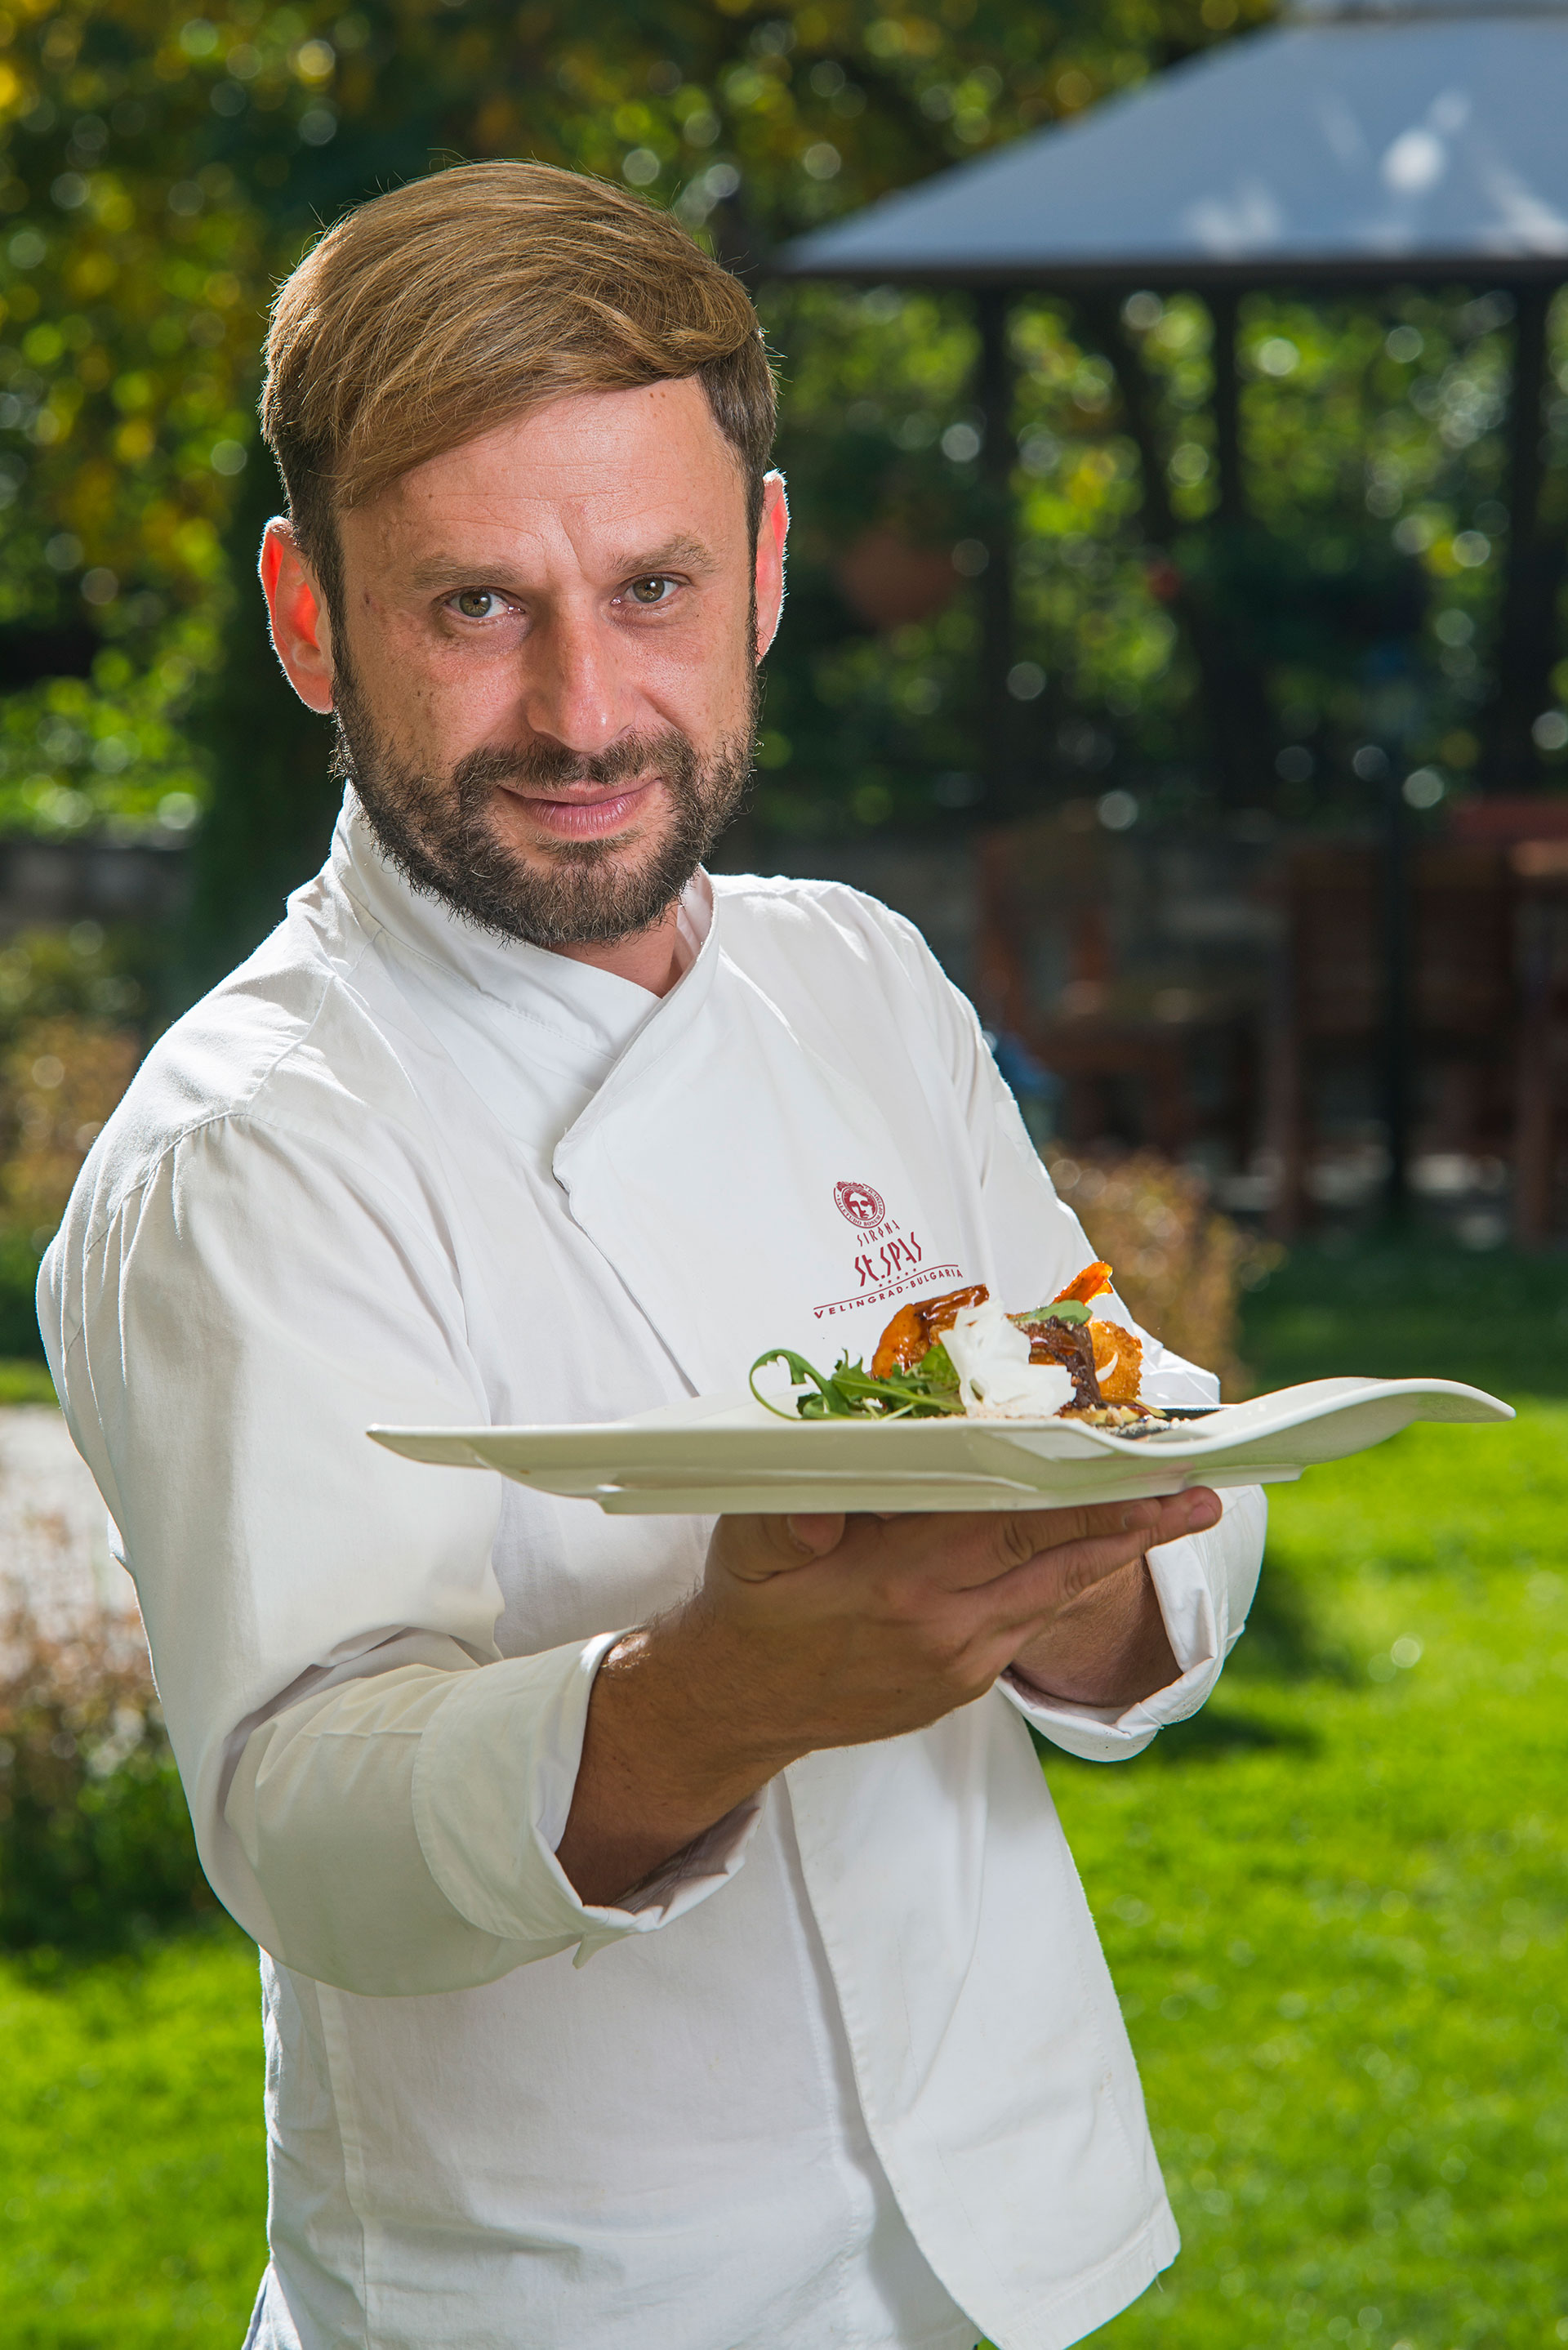 Kulinarni izkushenia v hotel Sveti Spas Velingrad. Кулинарни изкушения в Балнео Хотел Свети Спас Велинград